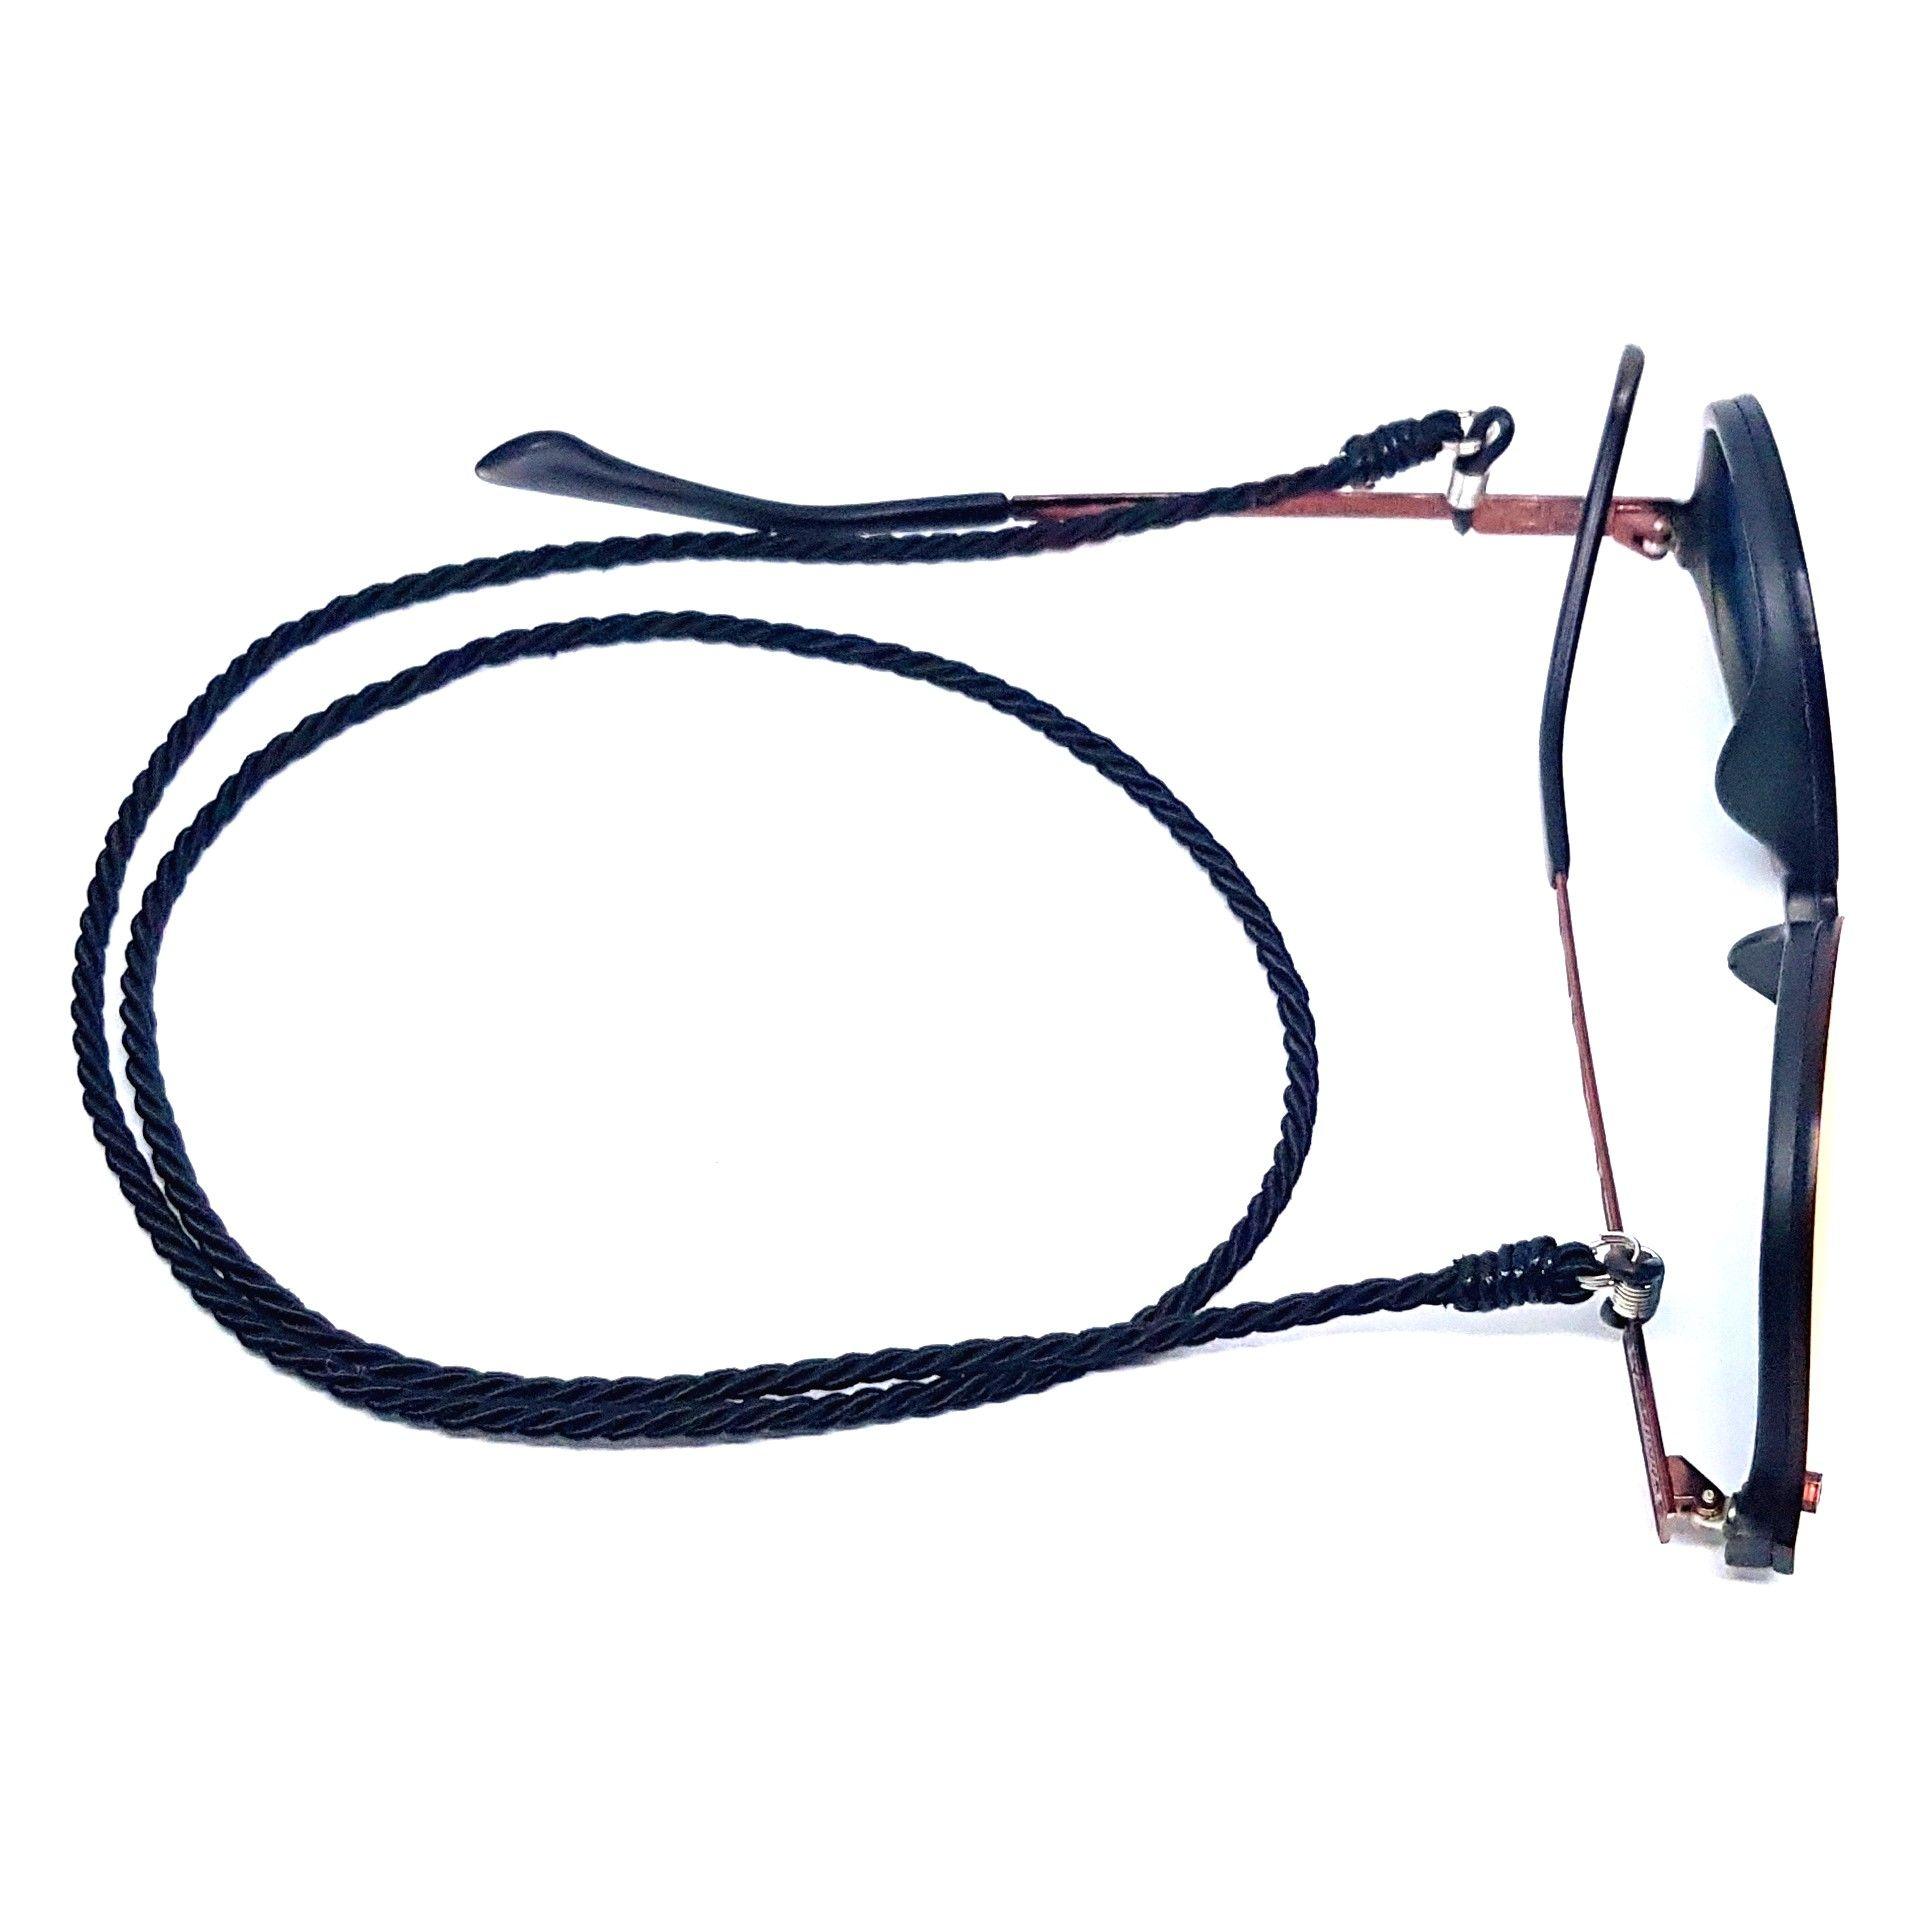 Cordão Empório Top Para Óculos Torneado Preto